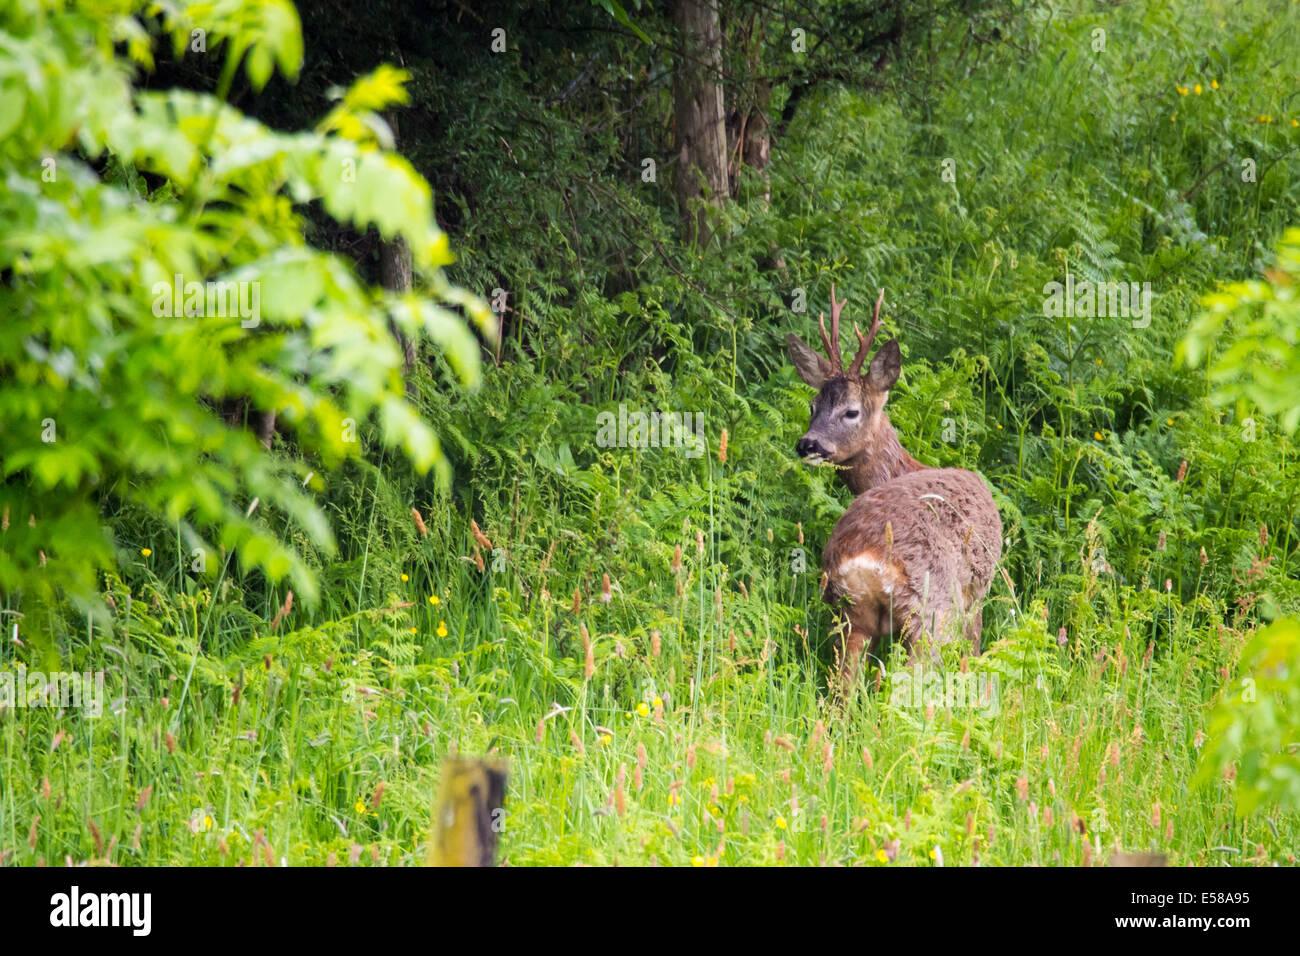 A Roe deer in Ambleside, Cumbria, UK - Stock Image